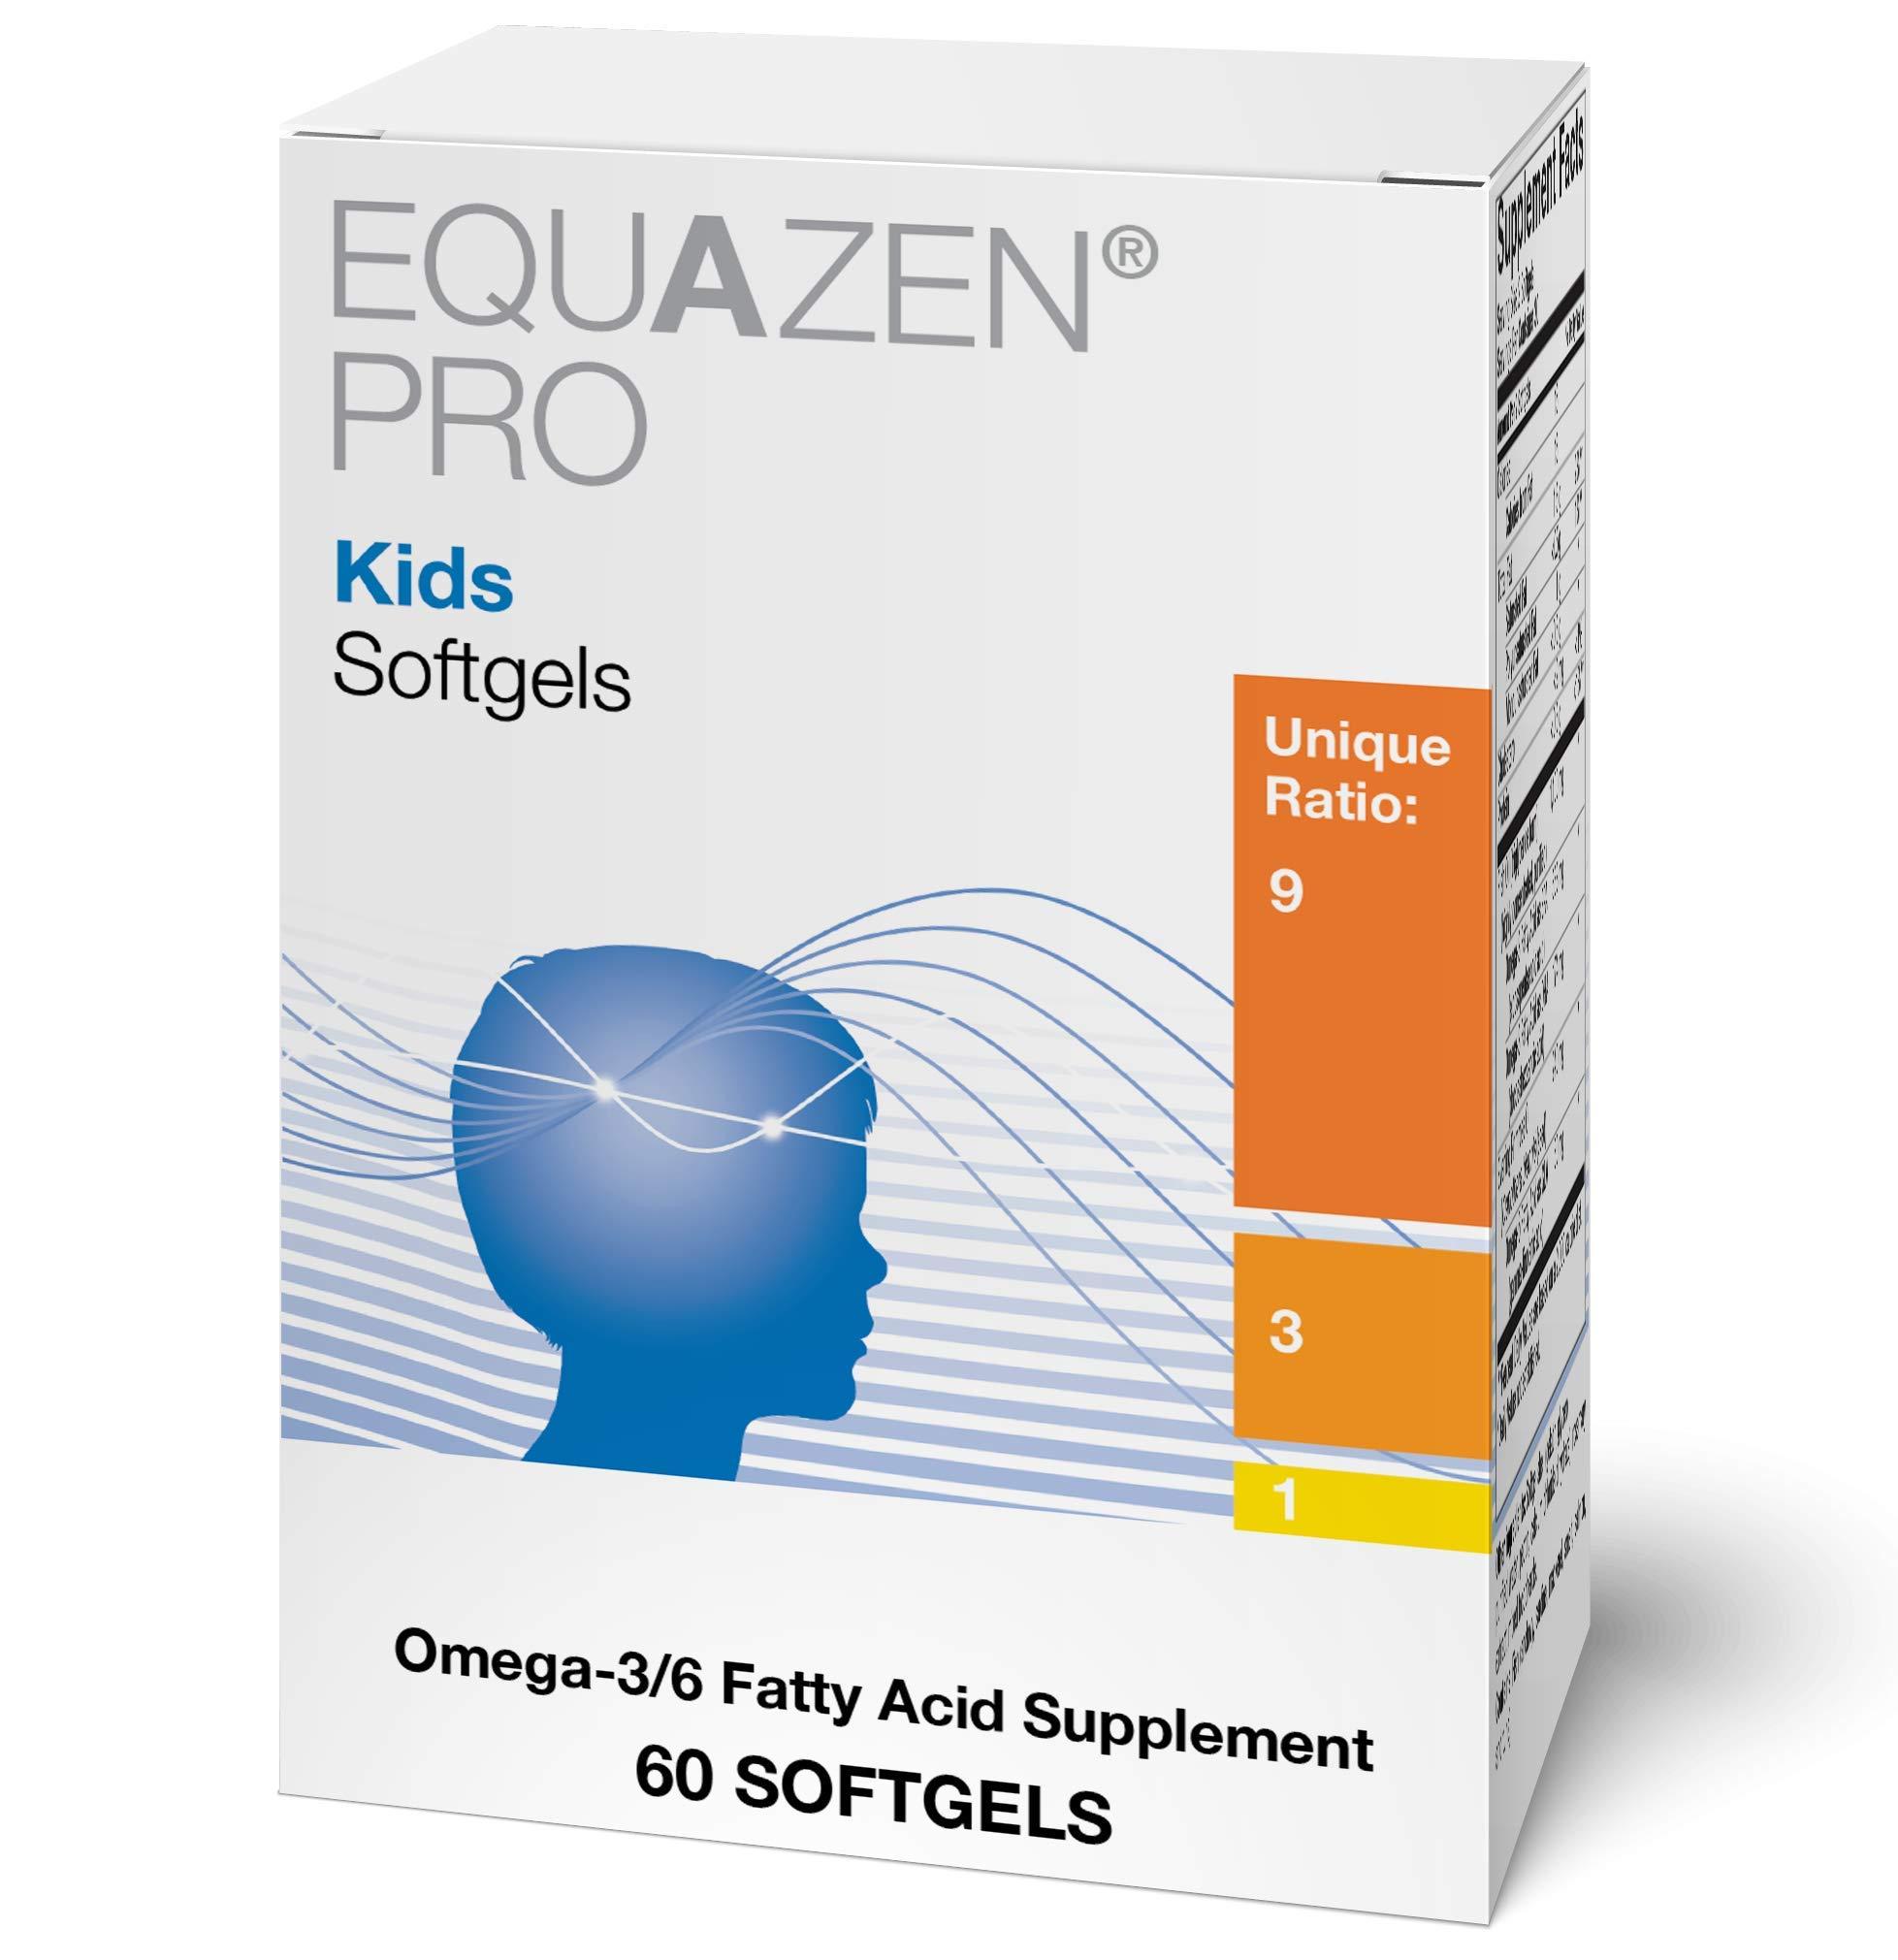 Equazen Pro Kids Softgels - Omega 3 6 Fish Oil with EPA & DHA (60 Softgels)